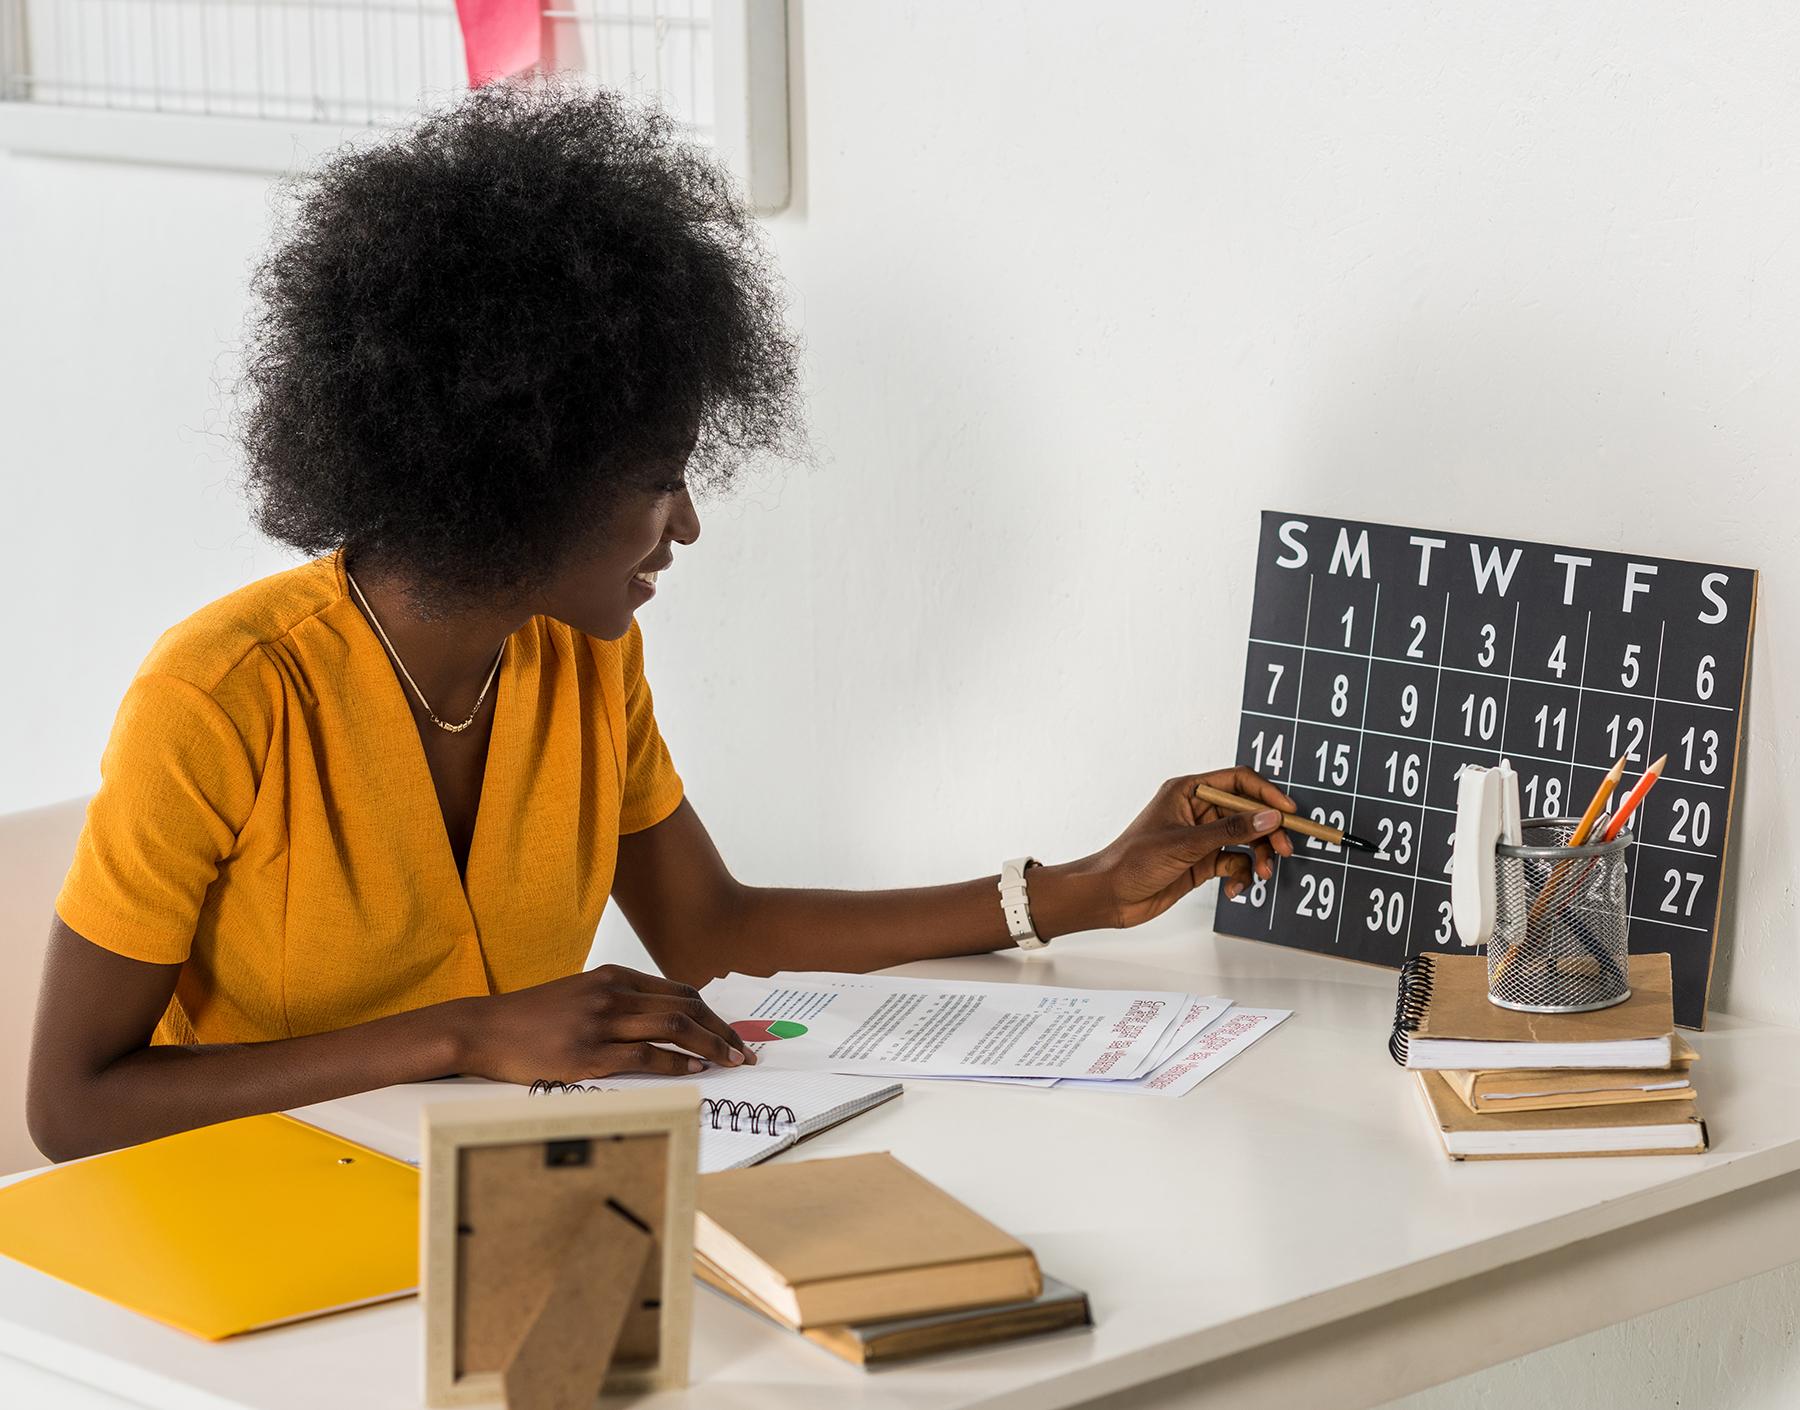 Ucsb Calendar 2022 2023.Workforce Administration Human Resources